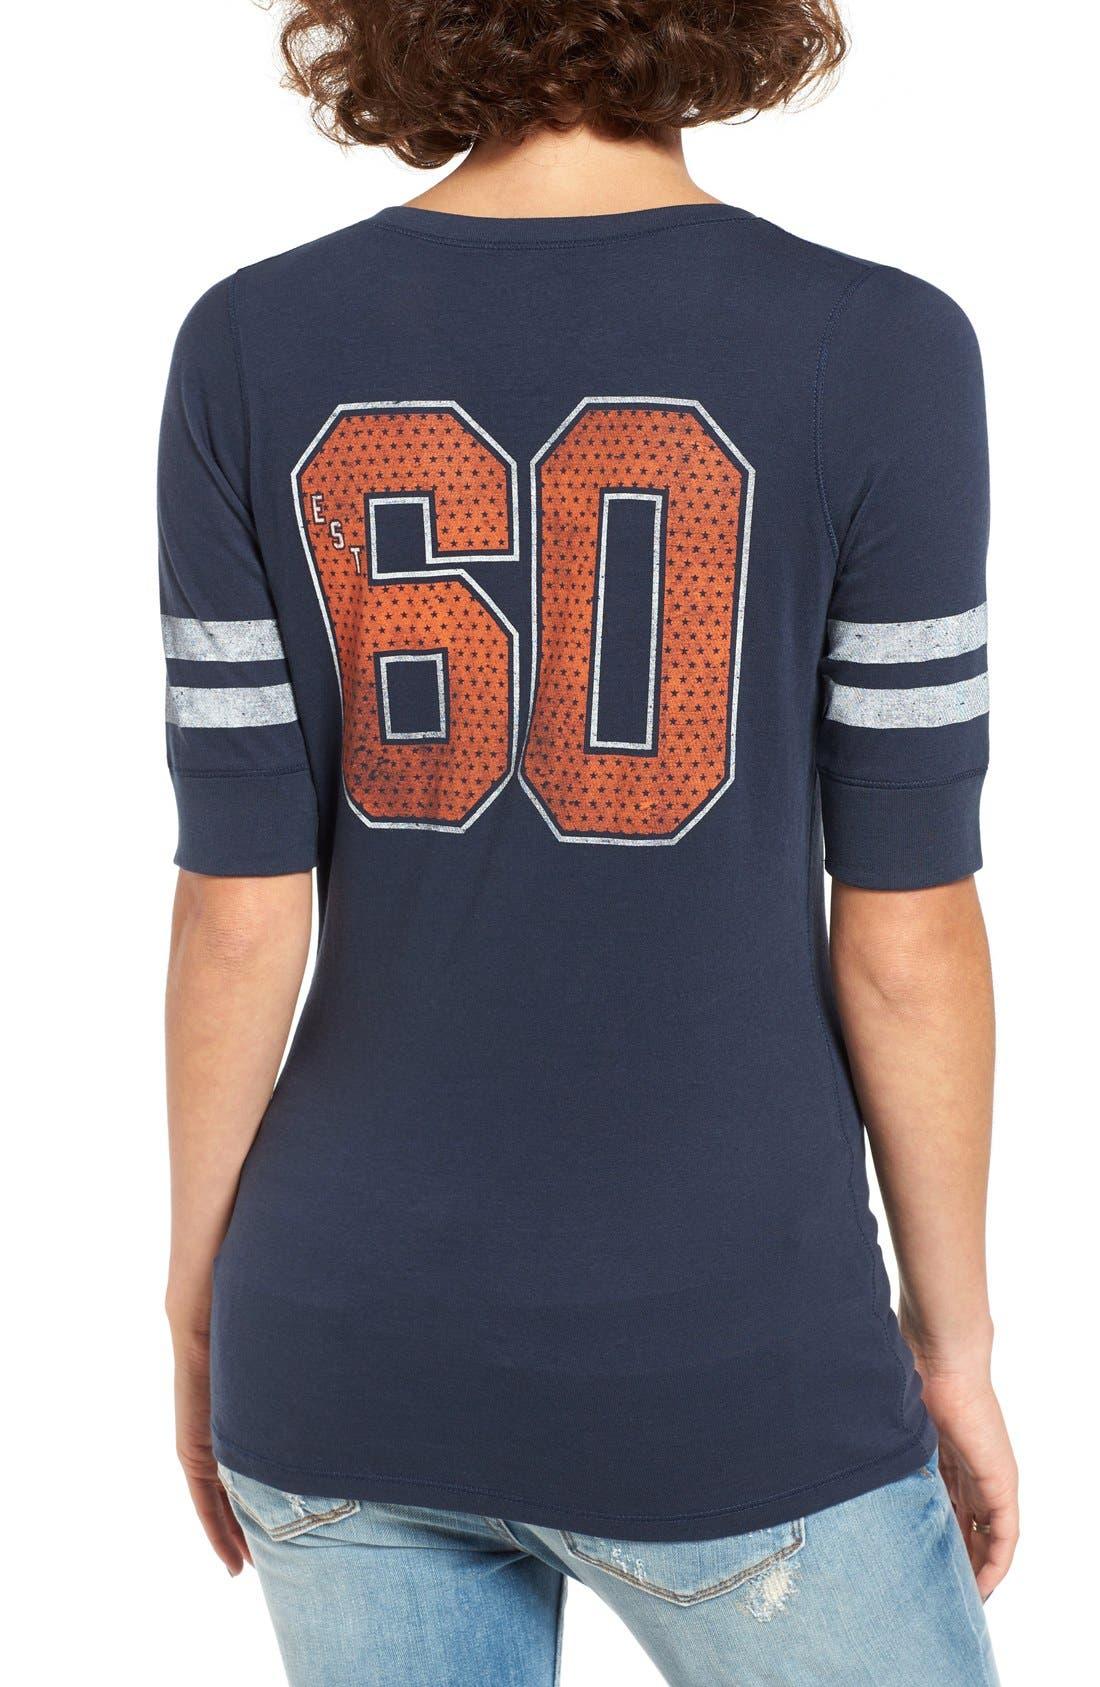 Alternate Image 2  - 47 Brand 'Denver Broncos - Flanker Backer' Graphic Tee